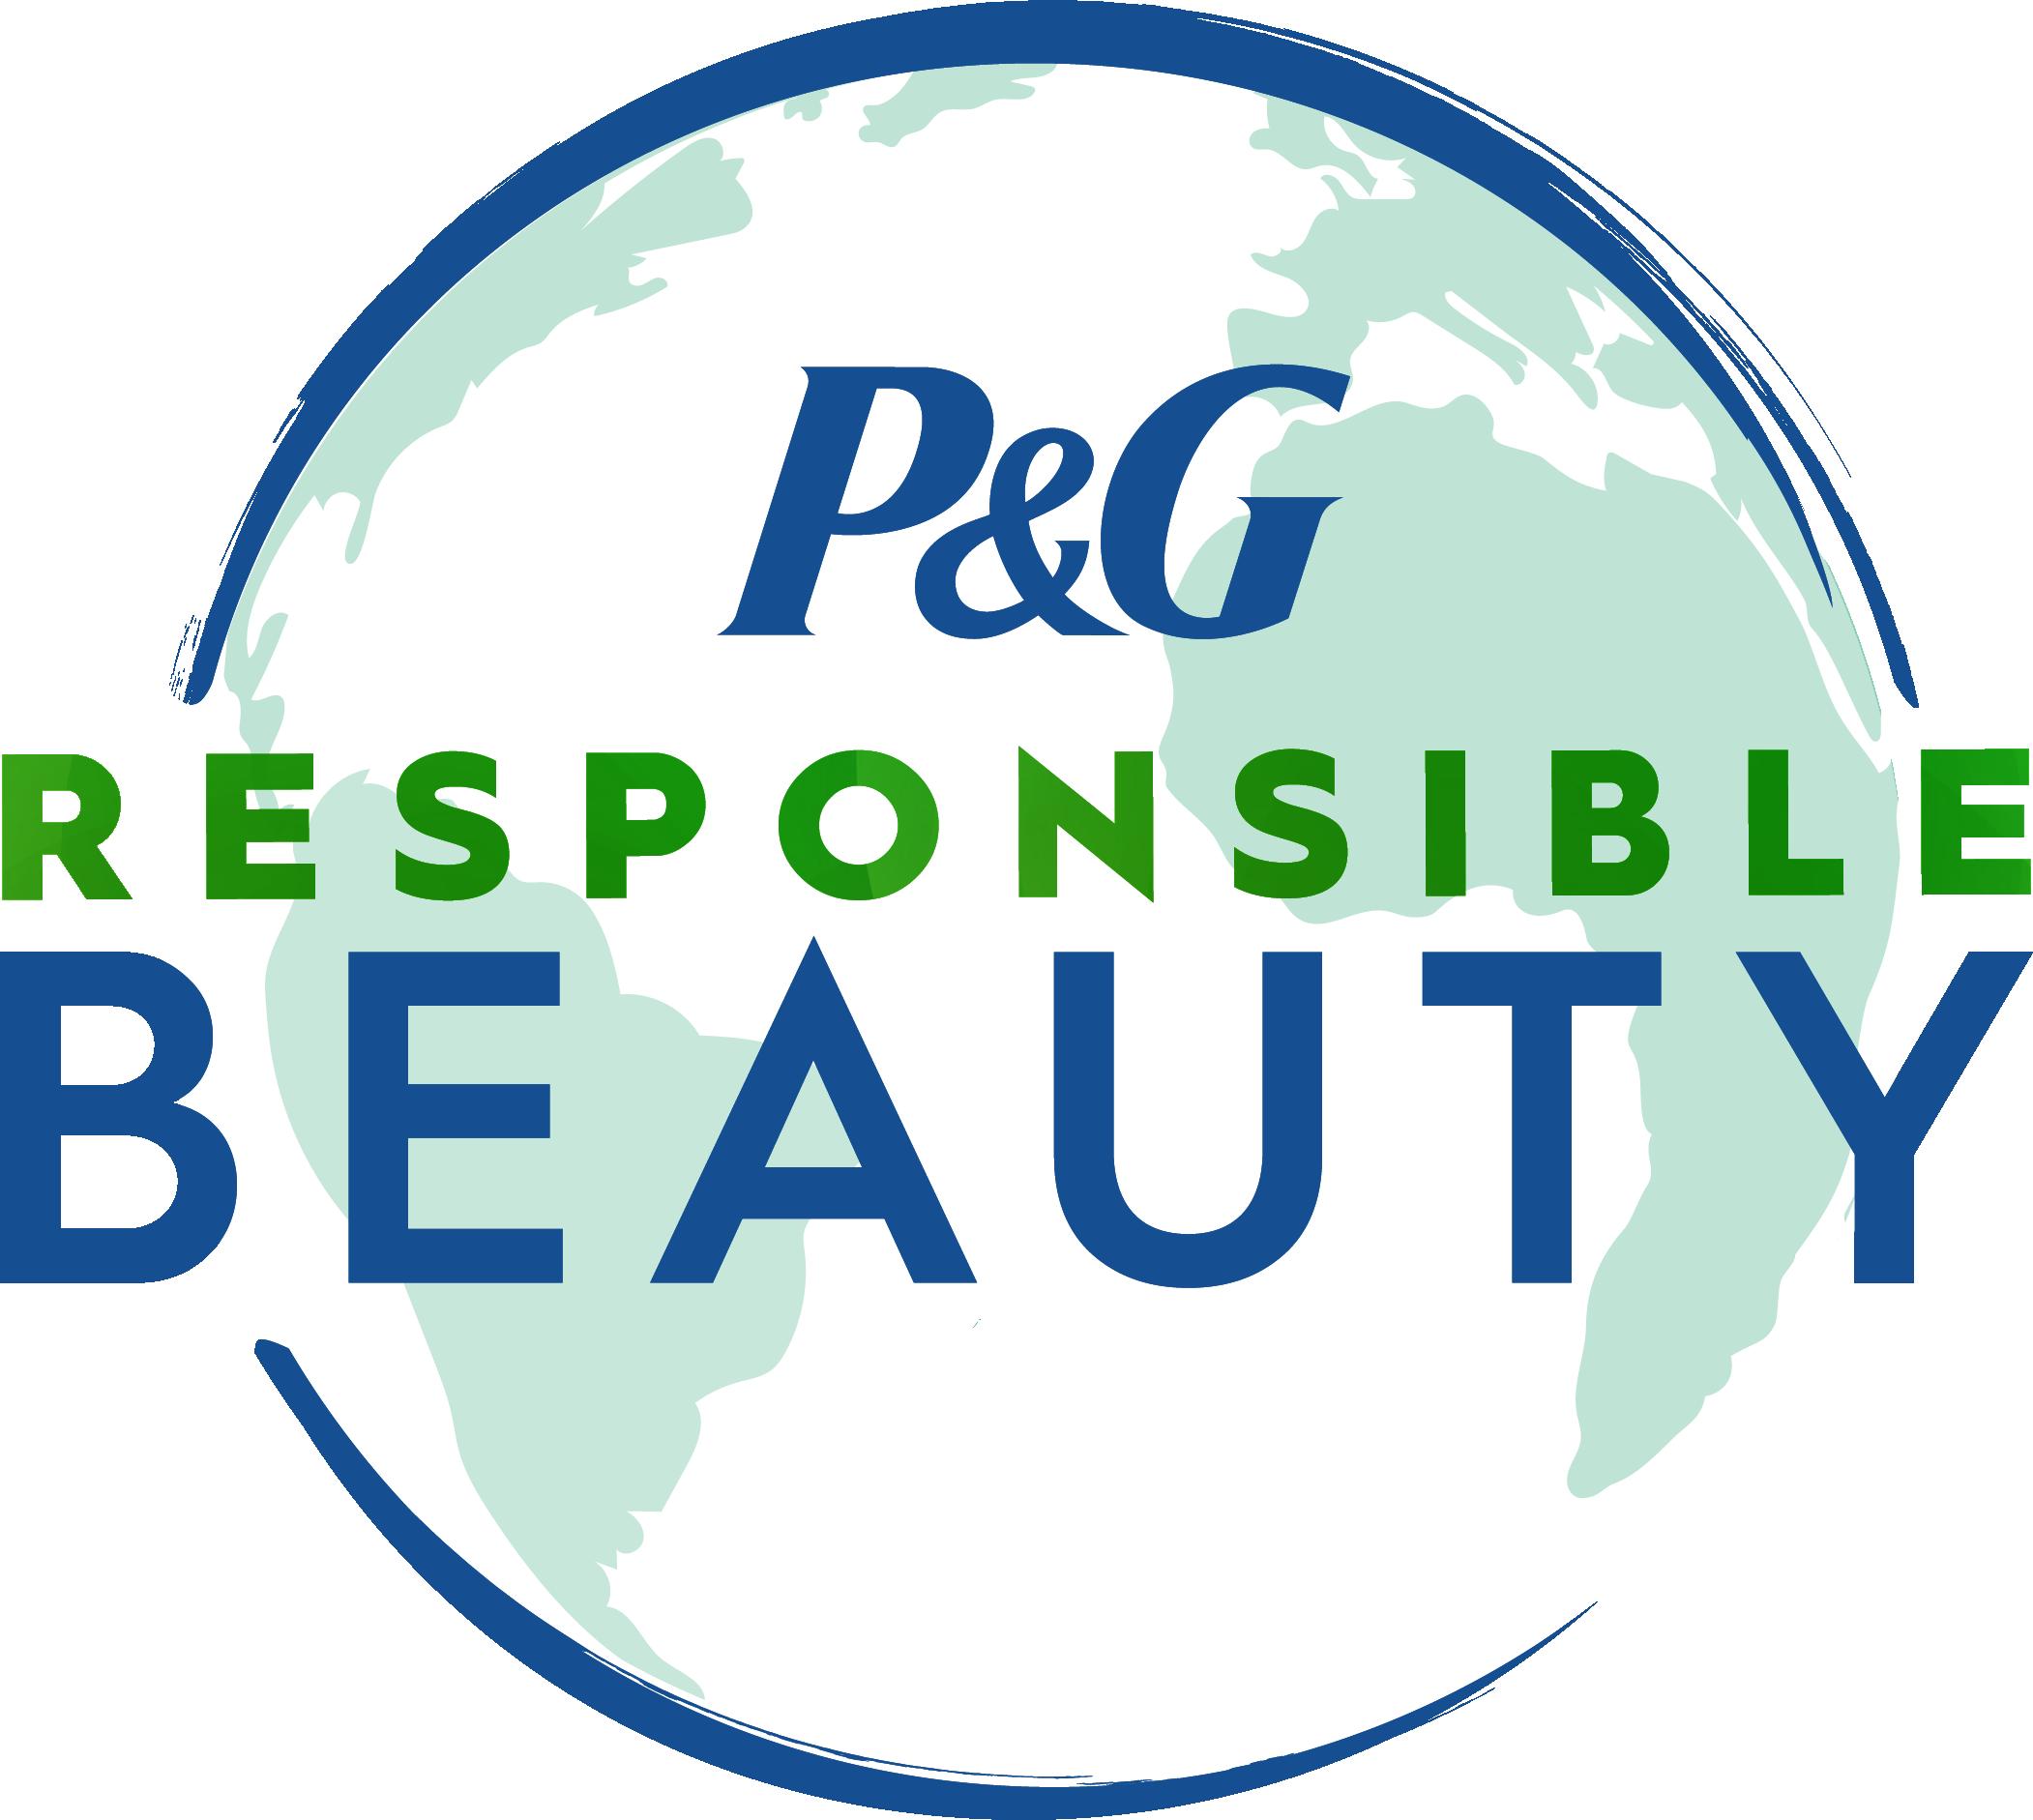 Responsible Beauty Logo